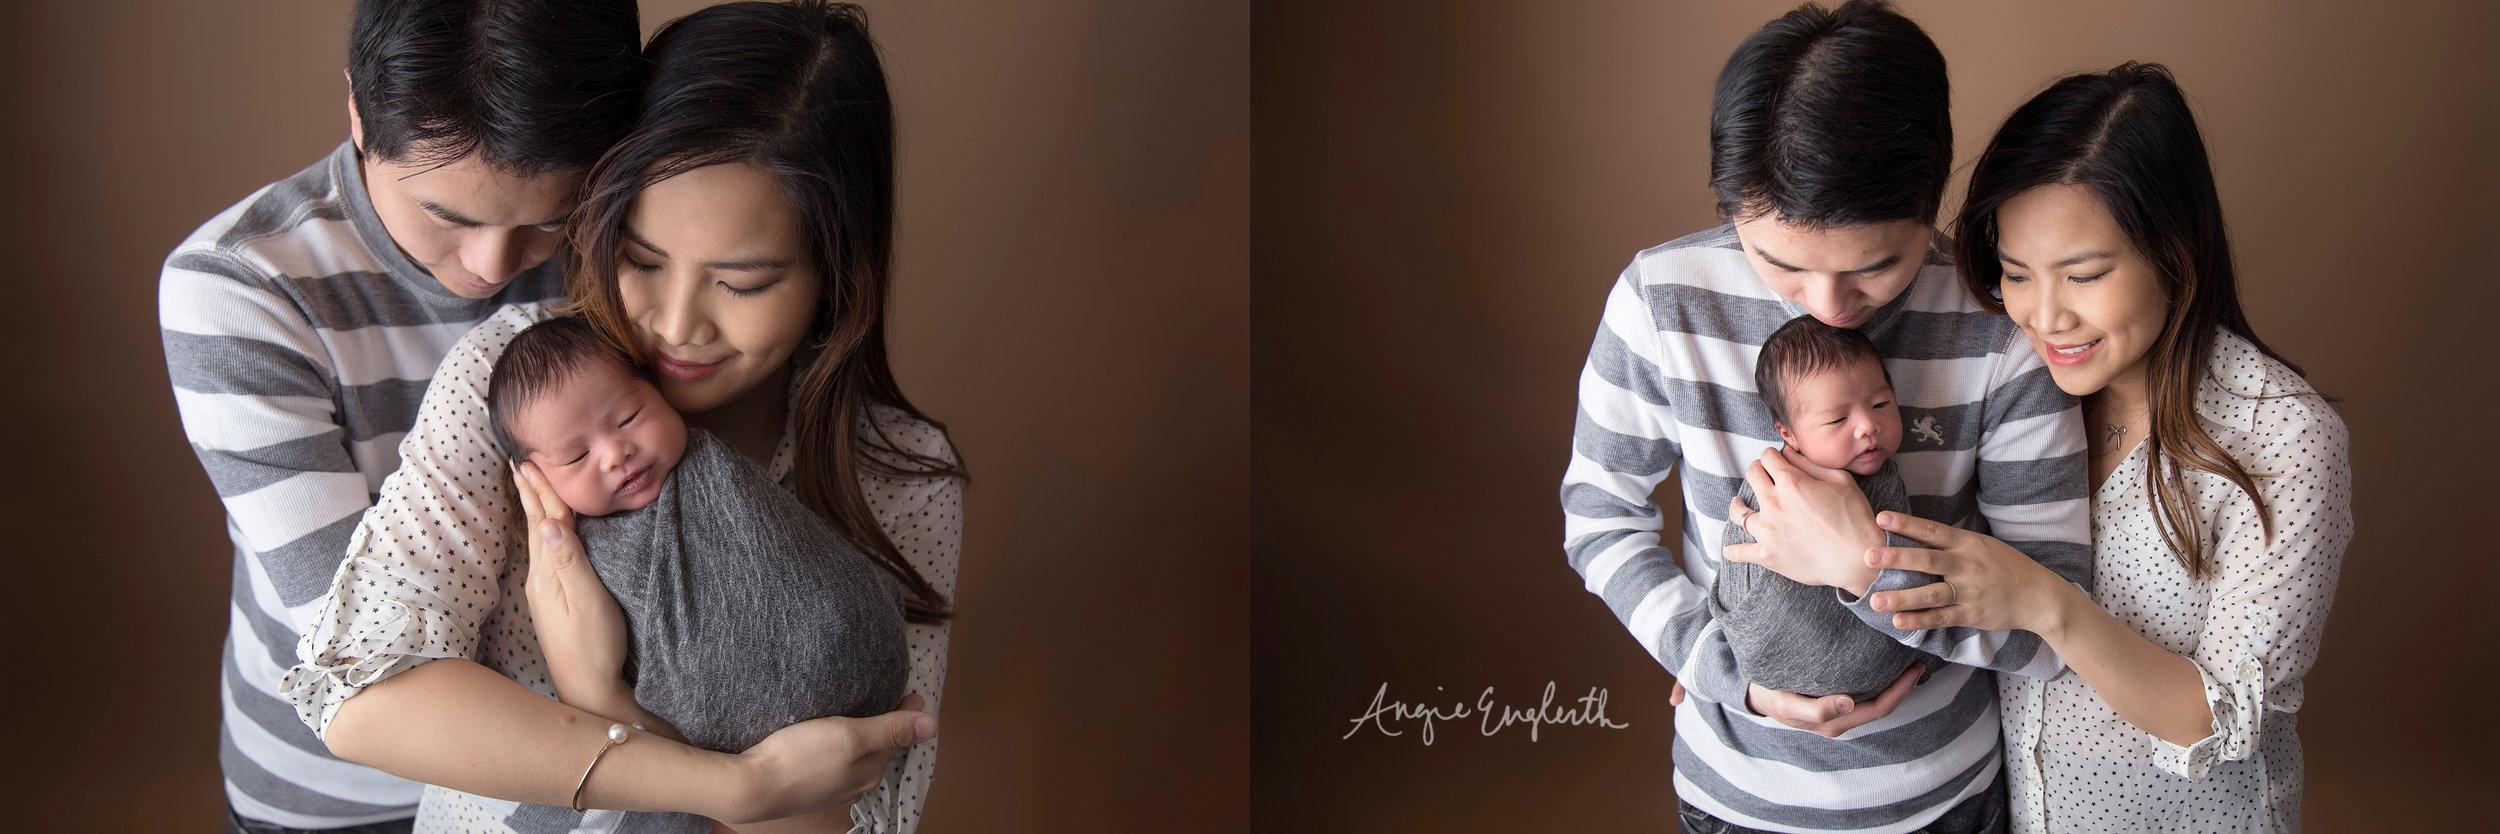 AngieEnglerthPhotography_Lancaster_Newborn_Photographer_022.jpg